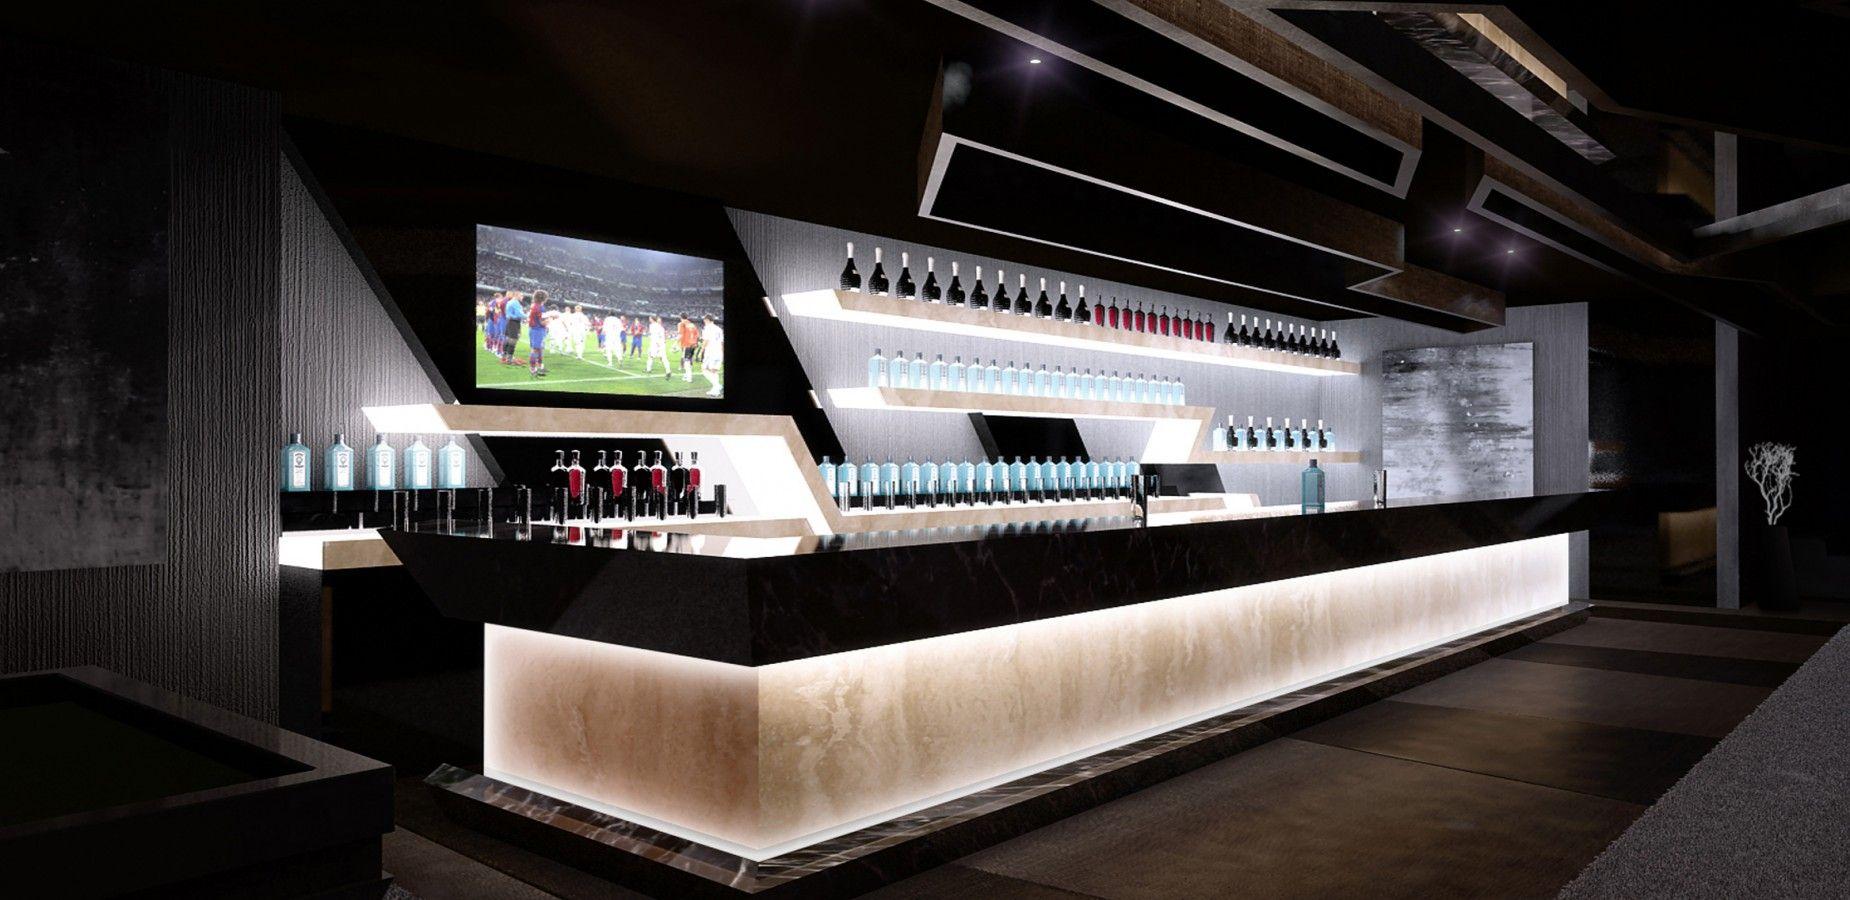 Lounge bar dise o de interiores interiorismo a cero in a cero estudio de arquitectura y - Barras de bar de diseno ...